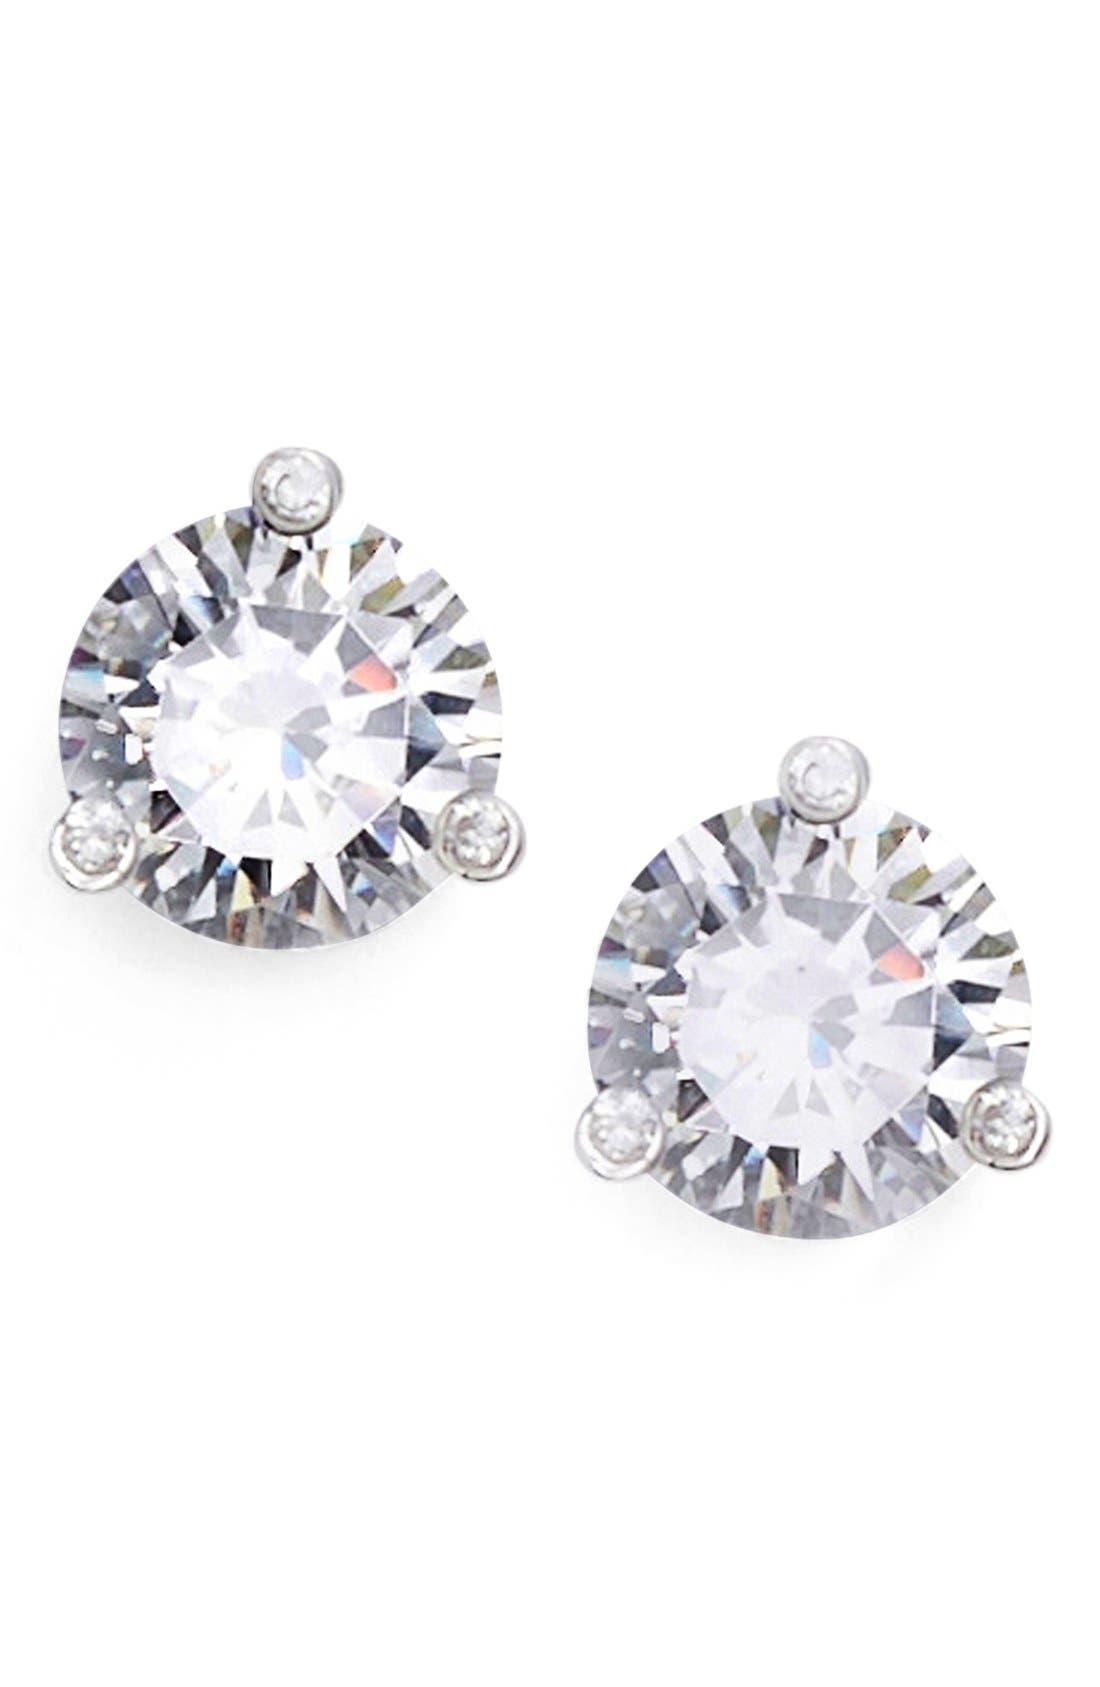 kate spade new york 'rise and shine' stud earrings